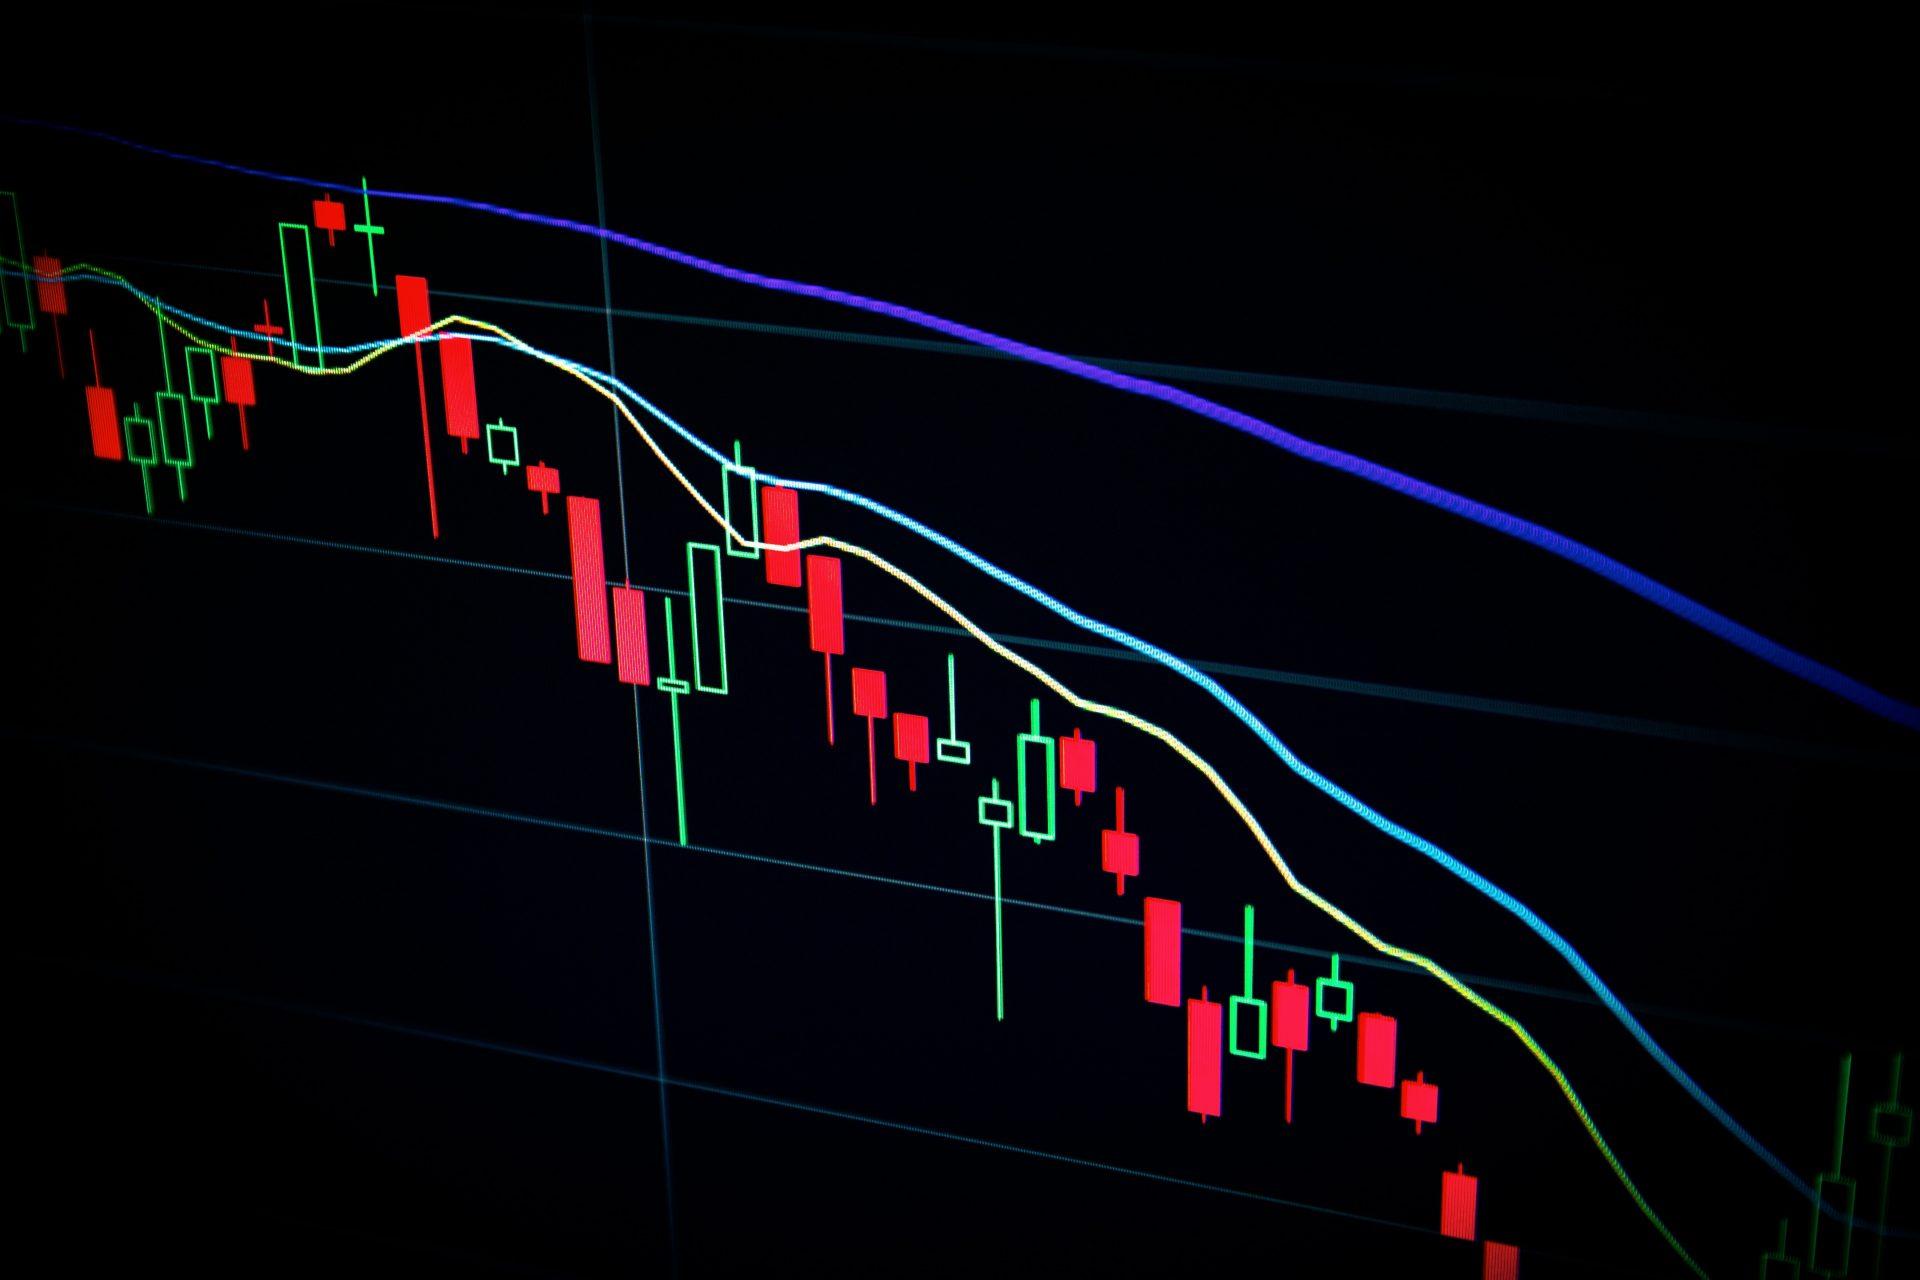 Bitcoin Miners Net Position Turn Positive: A Crypto Bull Case?